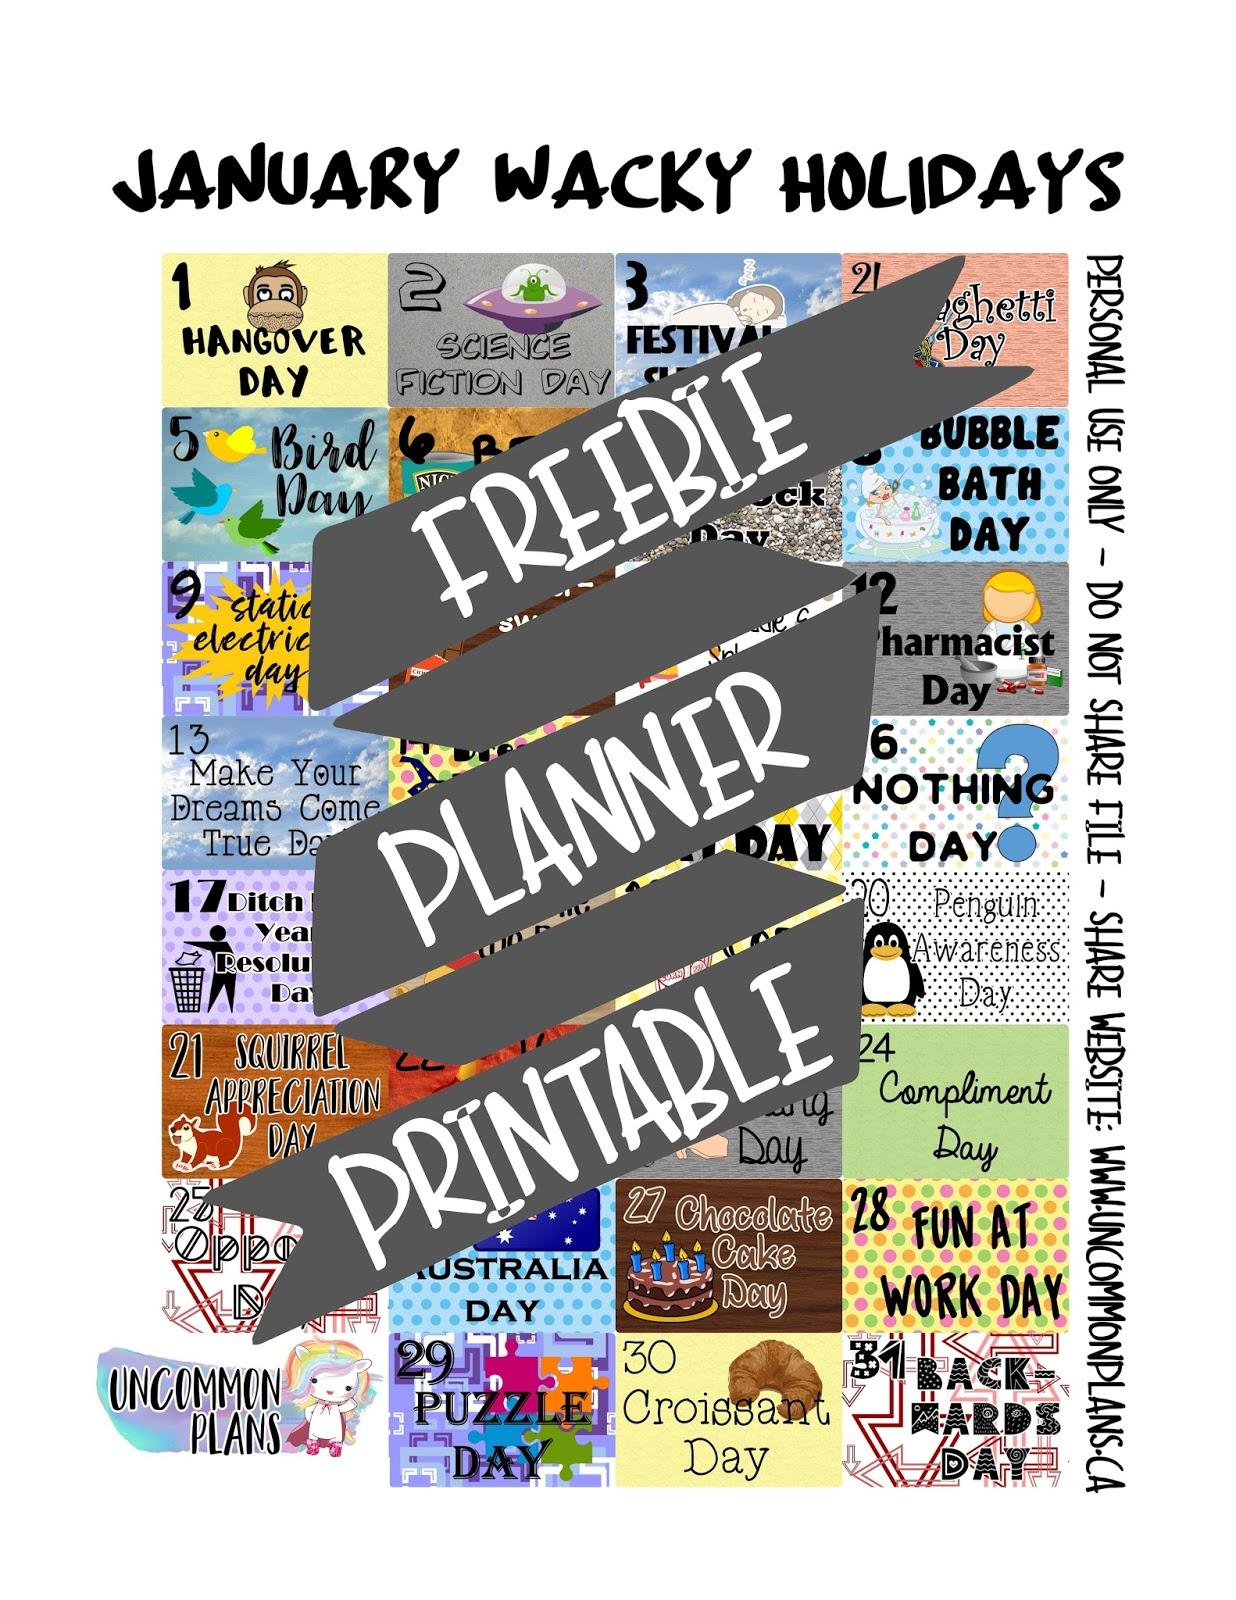 Uncommon Plans Free Planner Printable January Wacky Amp Fun Holidays